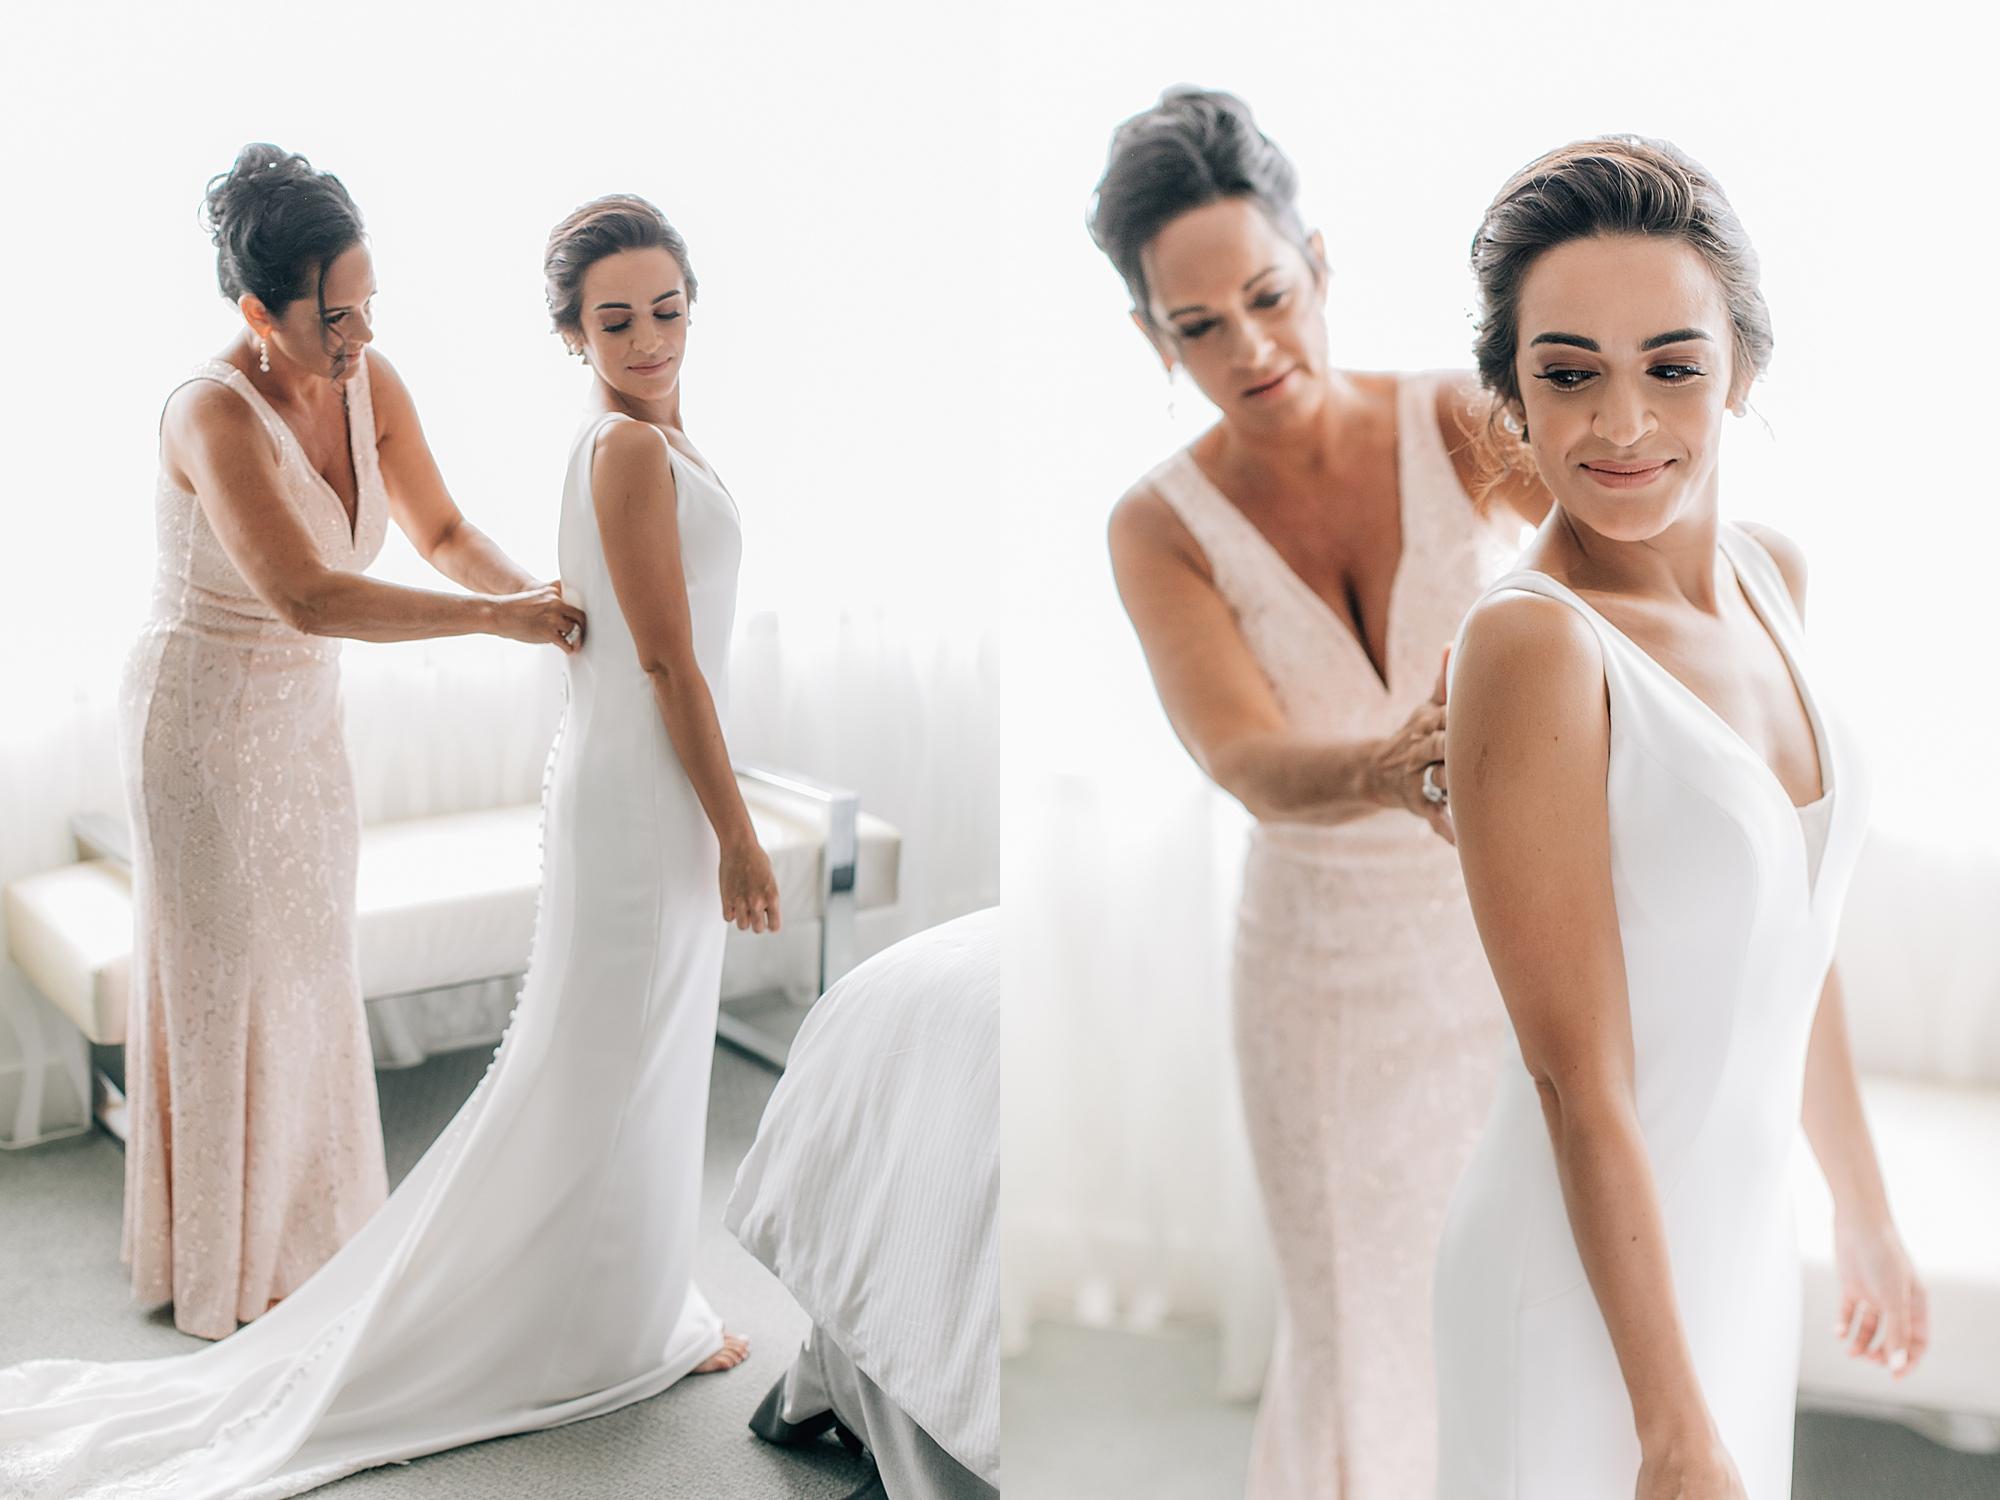 Cescaphe Philadelphia Film Wedding Photography by Magdalena Studios 5